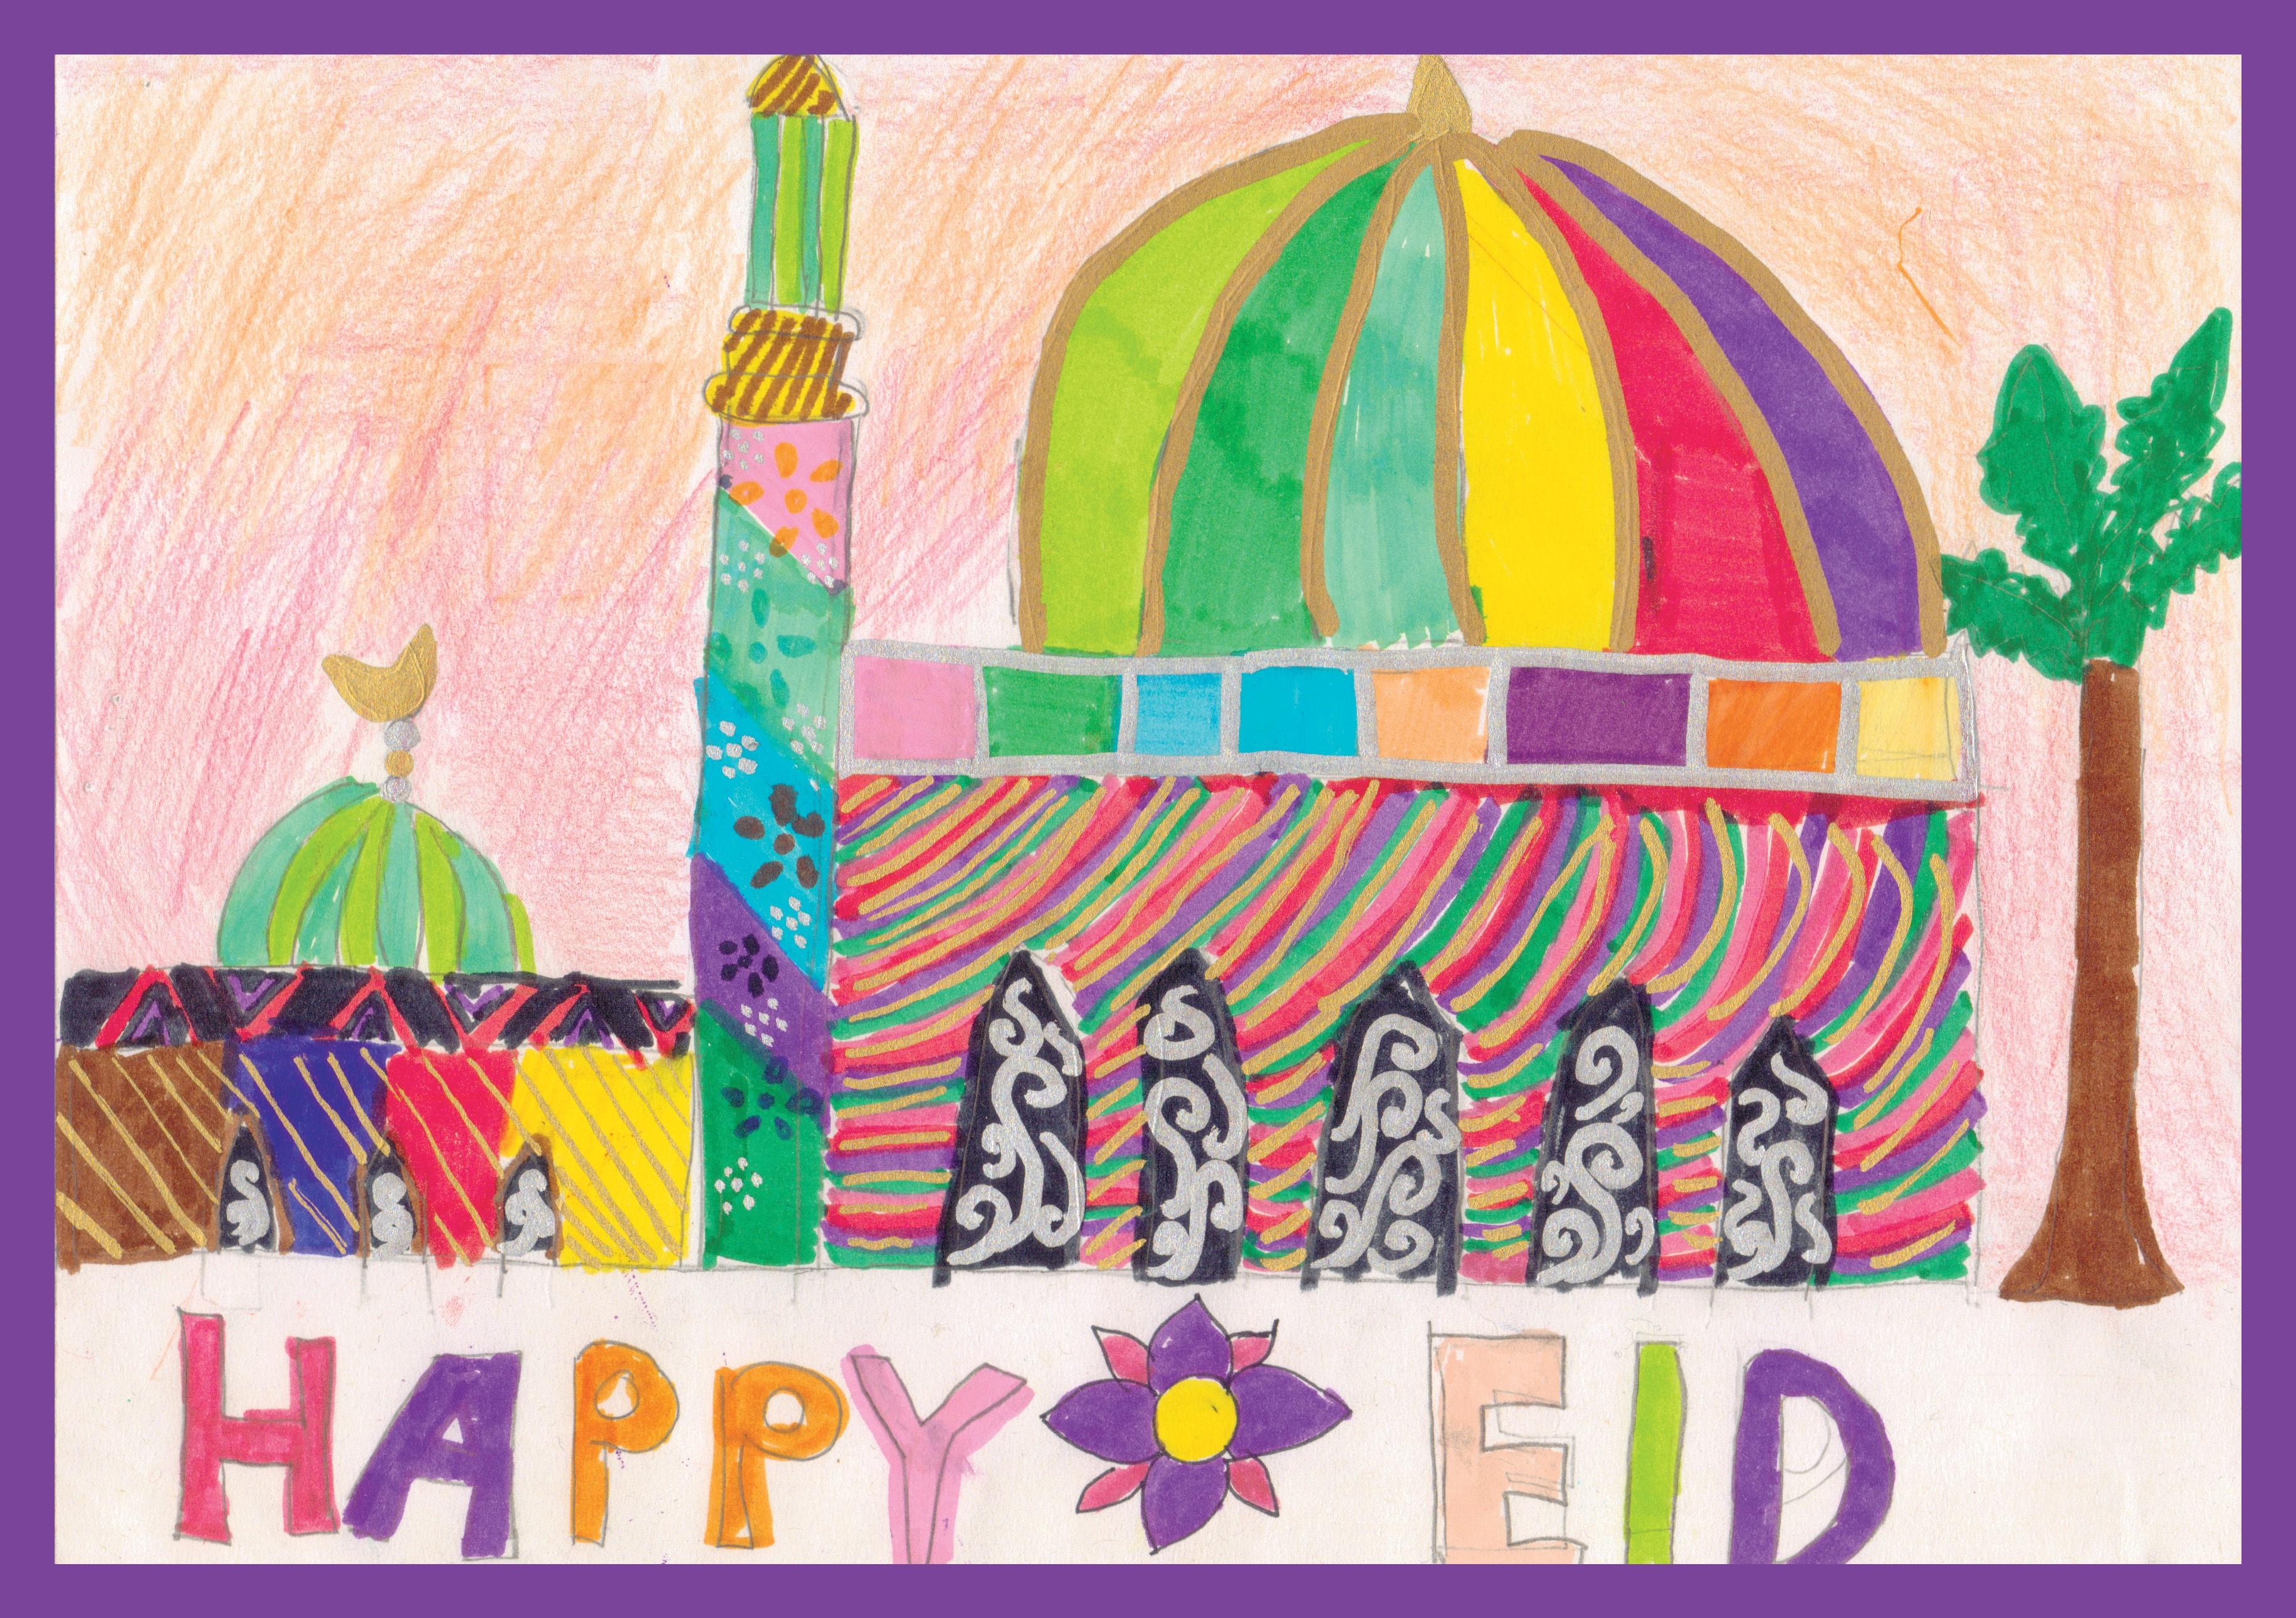 Eid_Card_2015.jpg